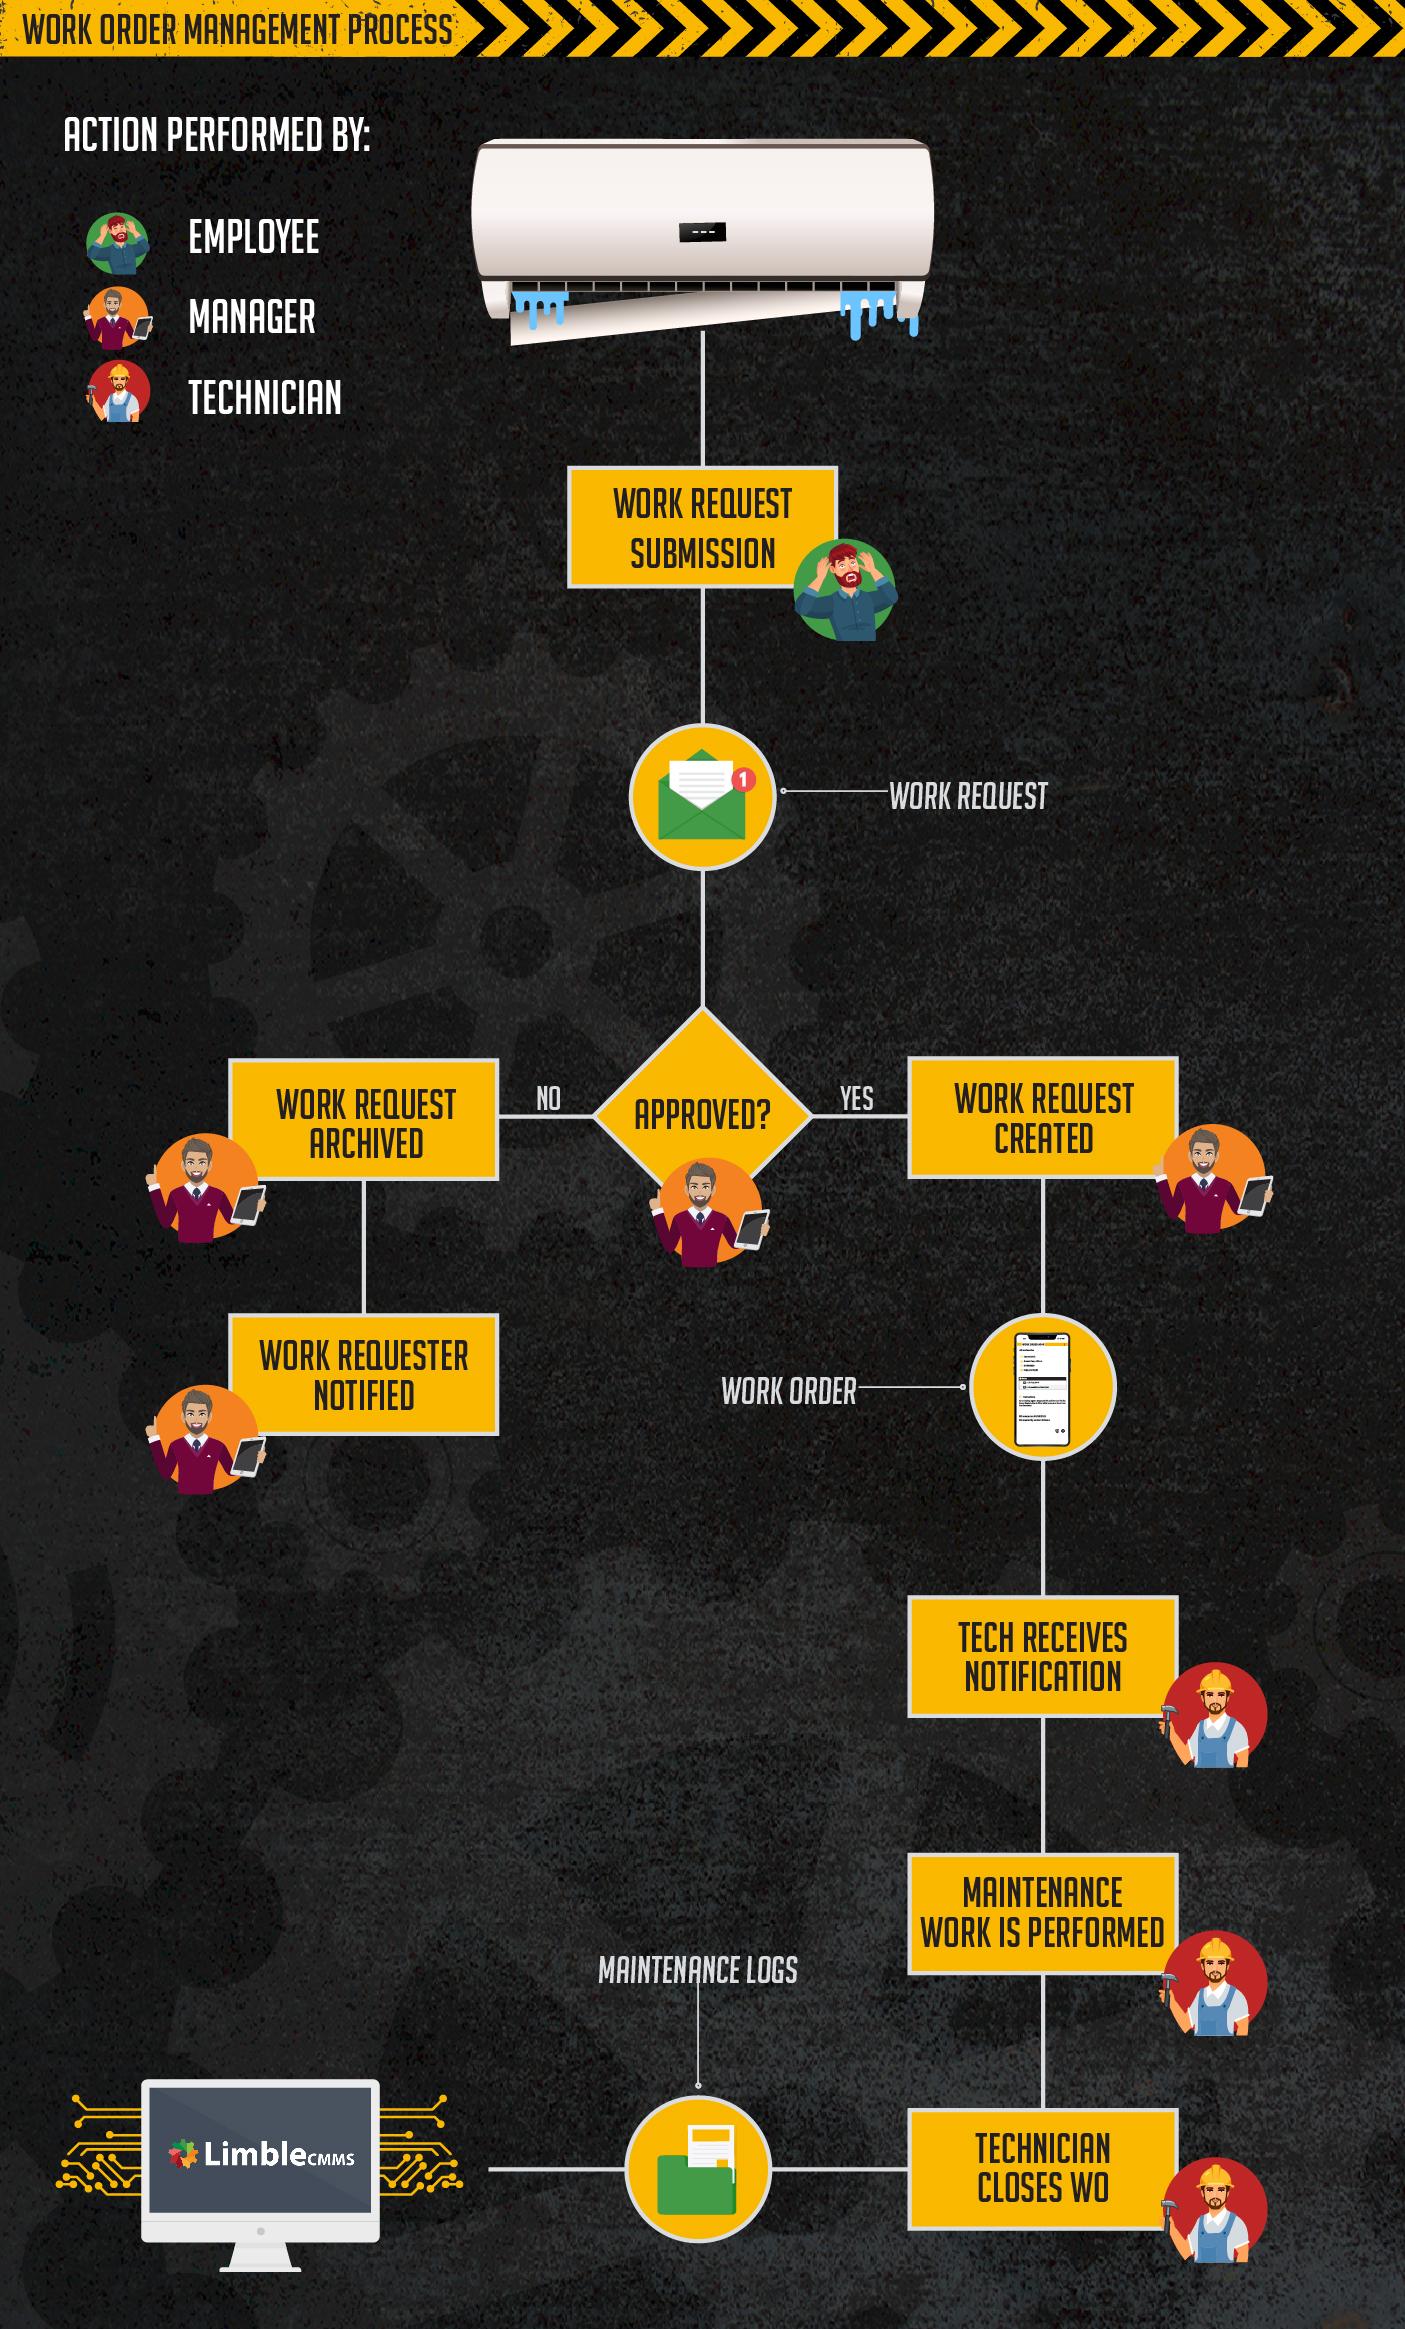 work order management process